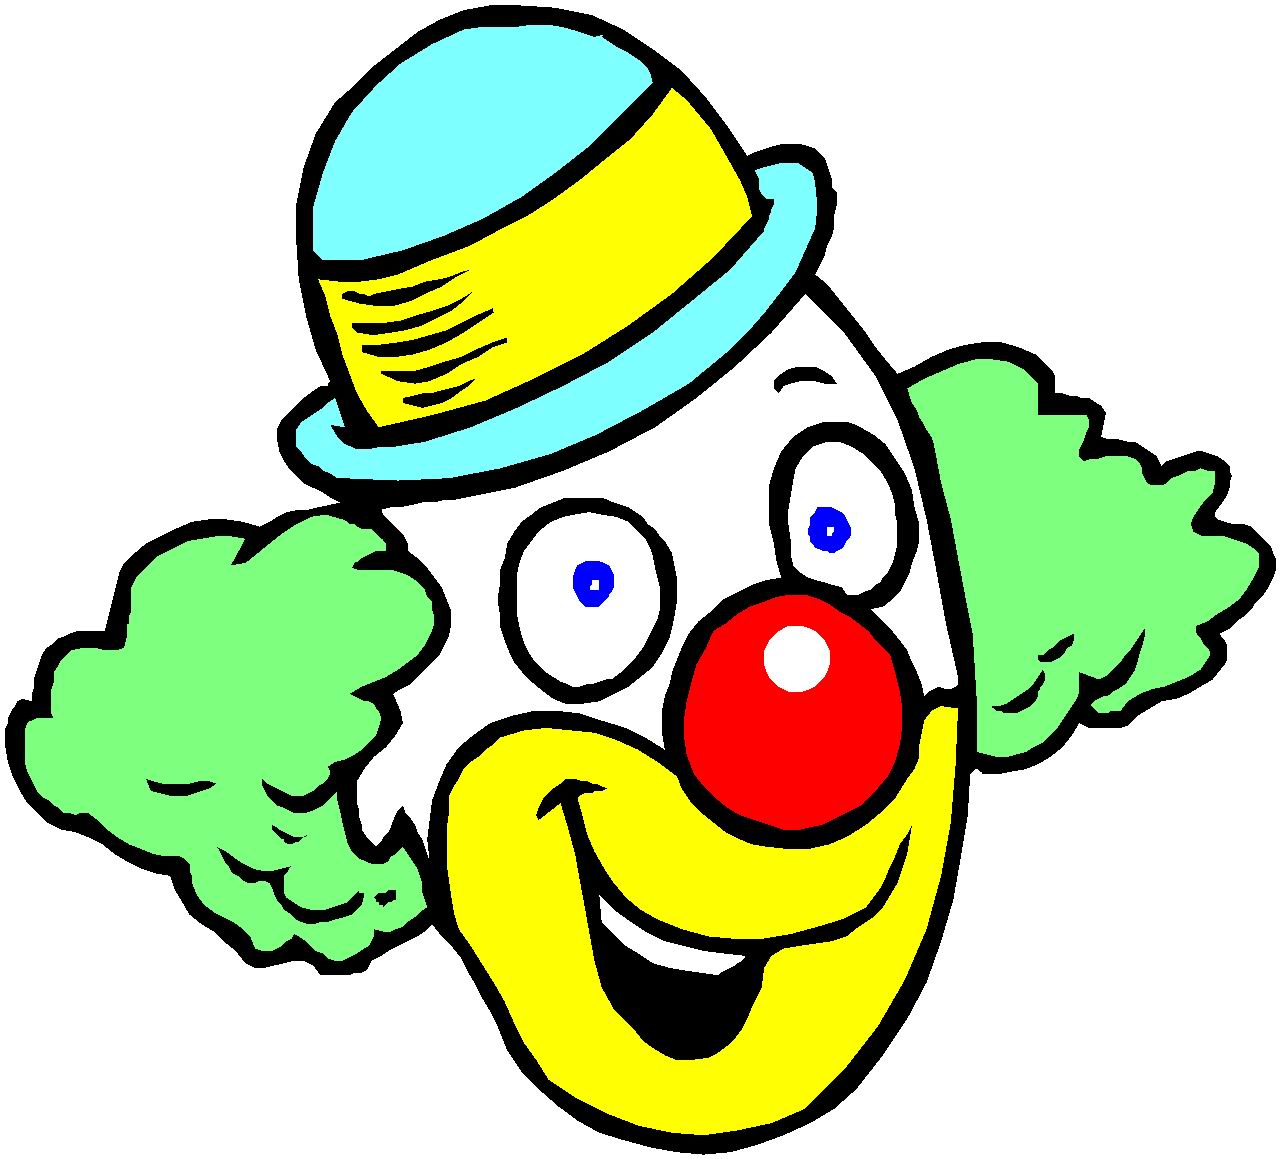 Halloween Clown Clipart - Clipart Kid-Halloween Clown Clipart - Clipart Kid-11